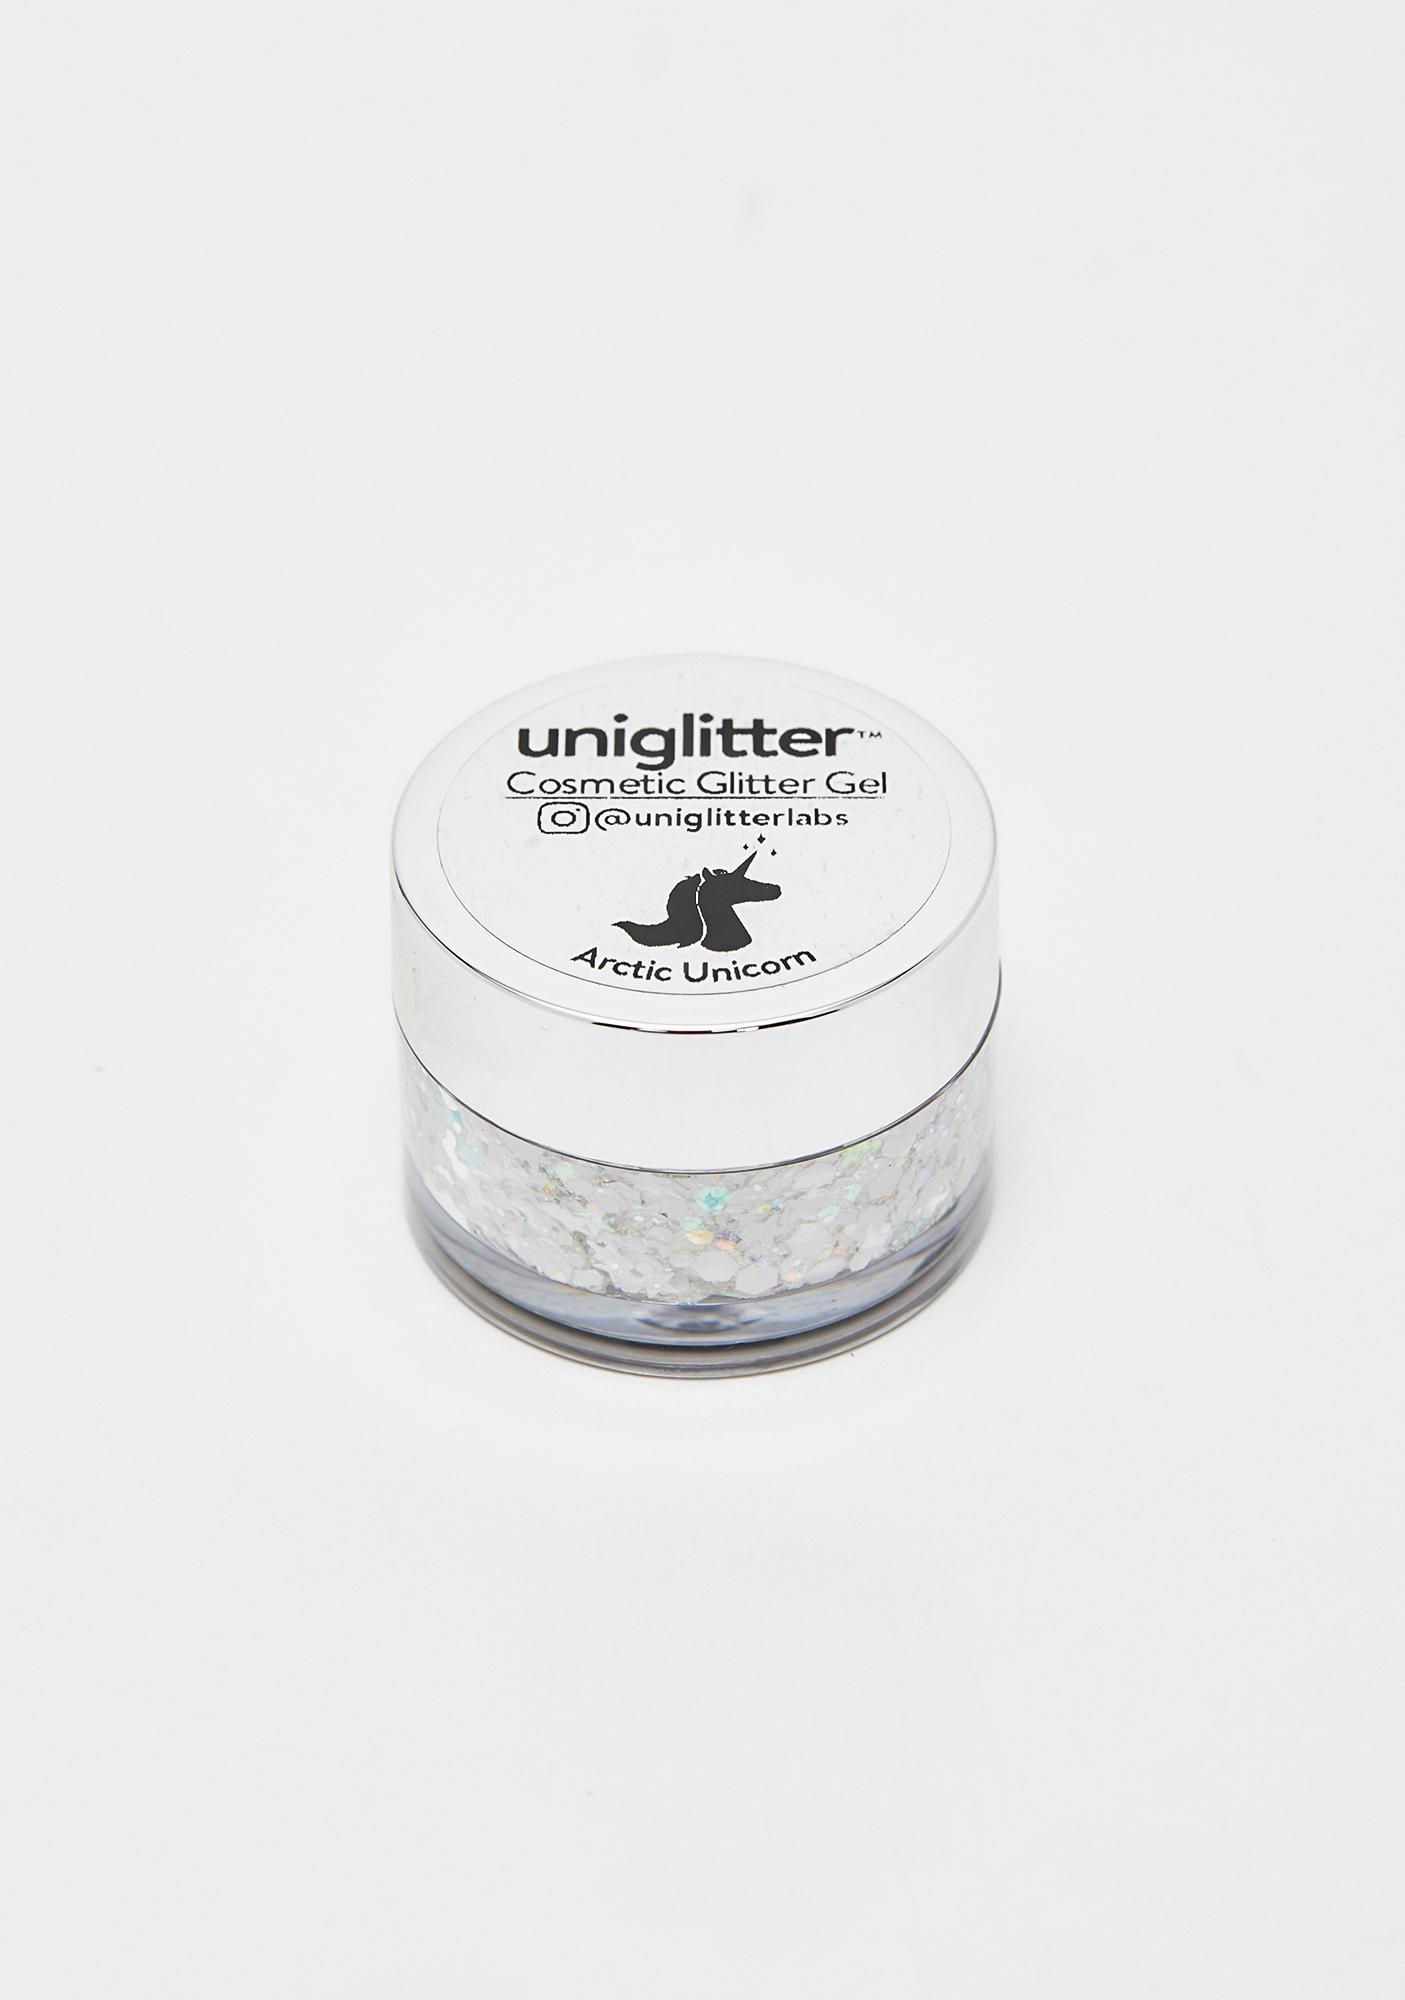 Uniglitter Arctic UV Unicorn Glitter Gel